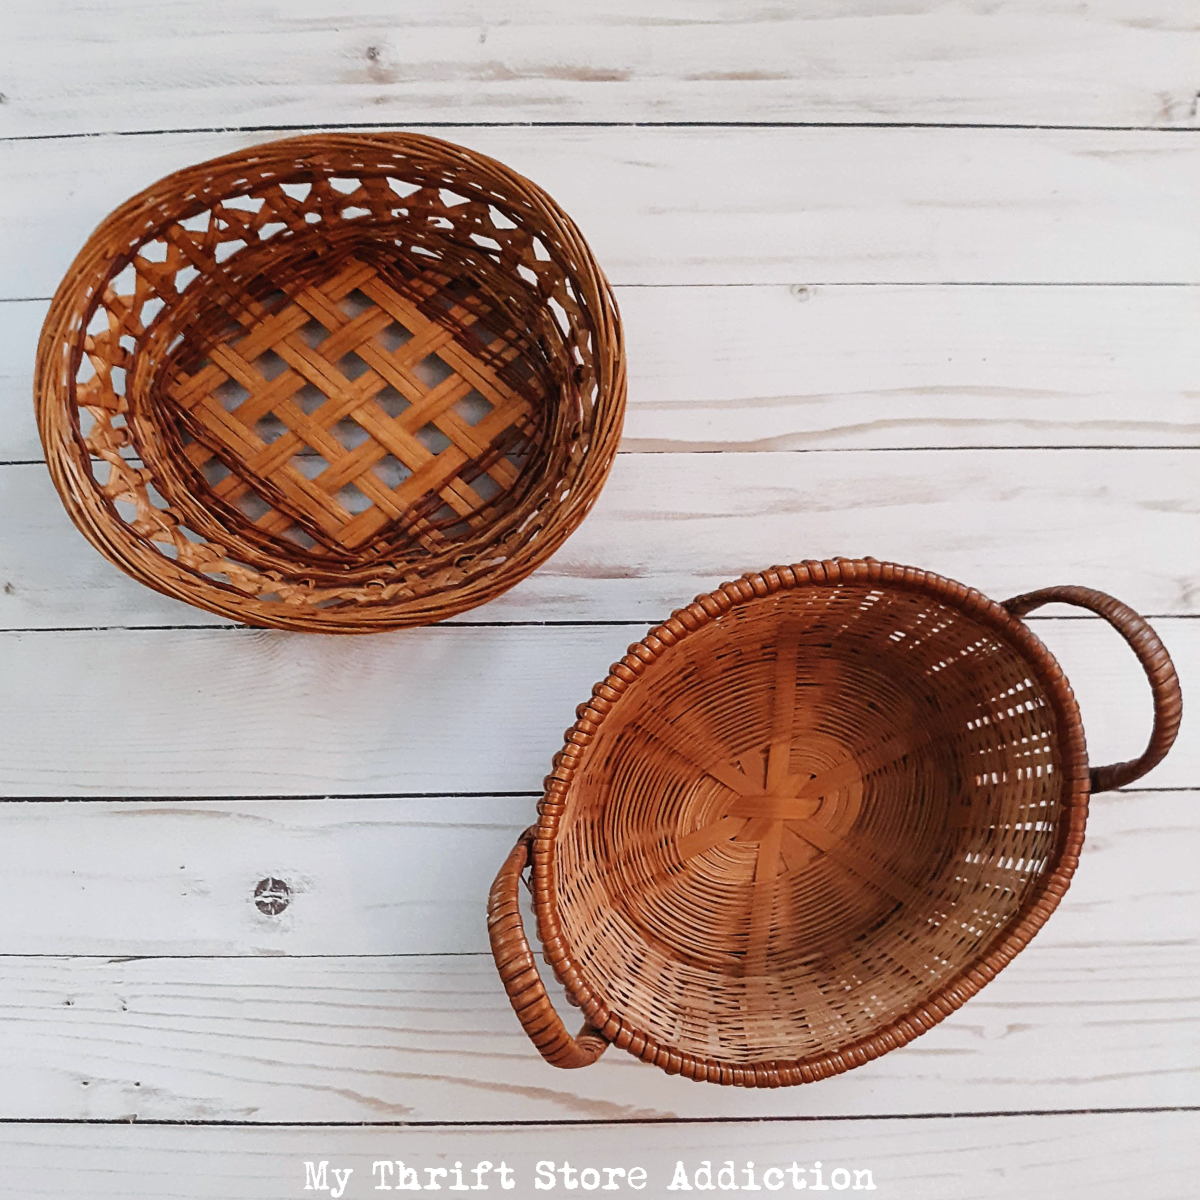 thrift store baskets